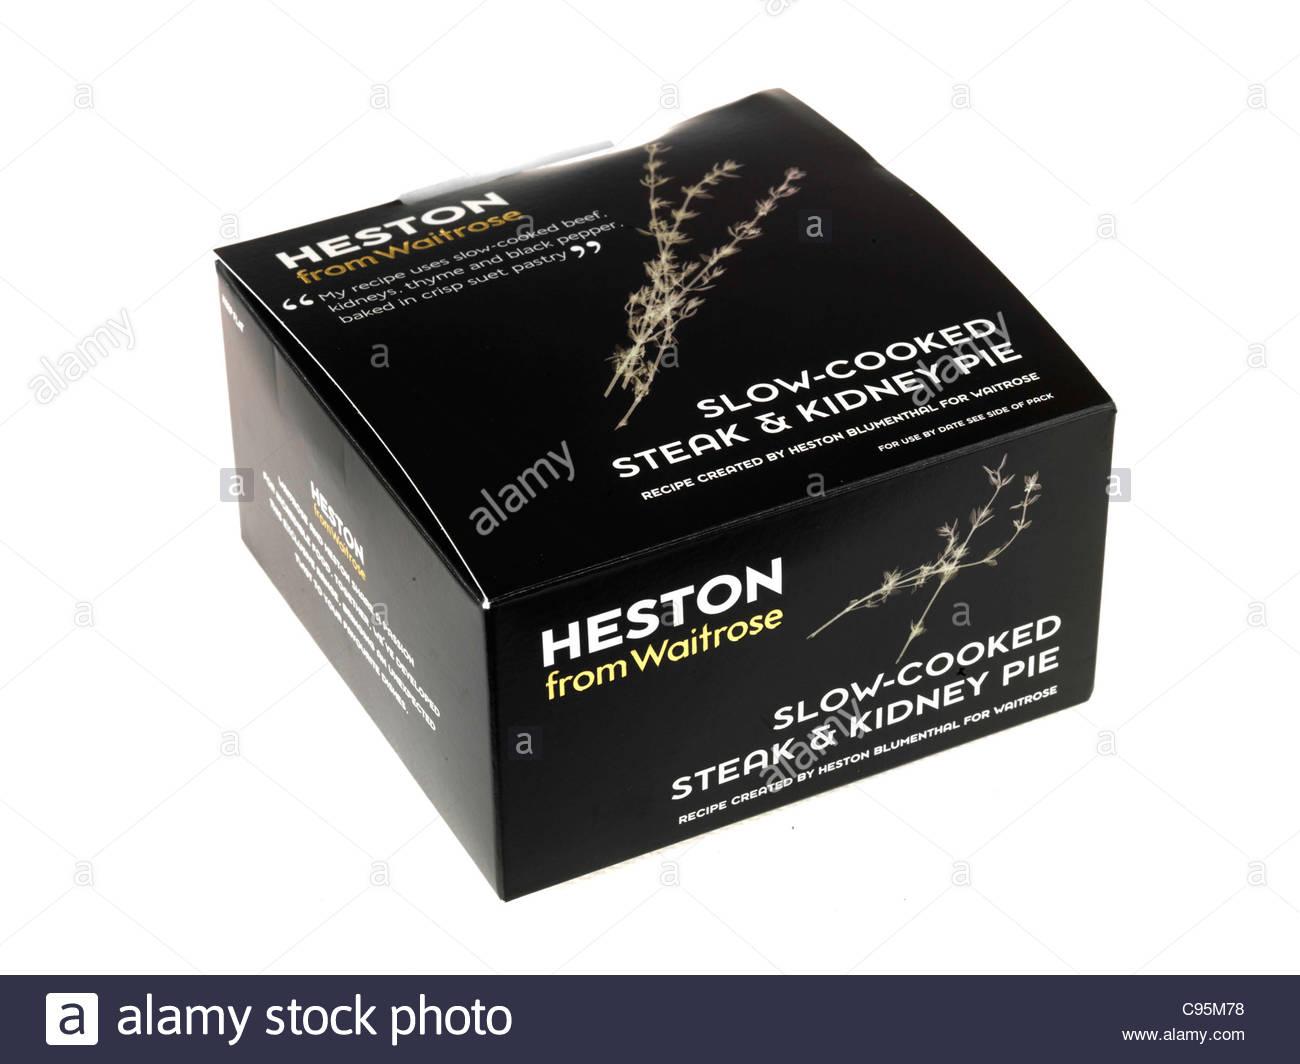 Hestons Slow Cooked Steak & Kidney Pie - Stock Image